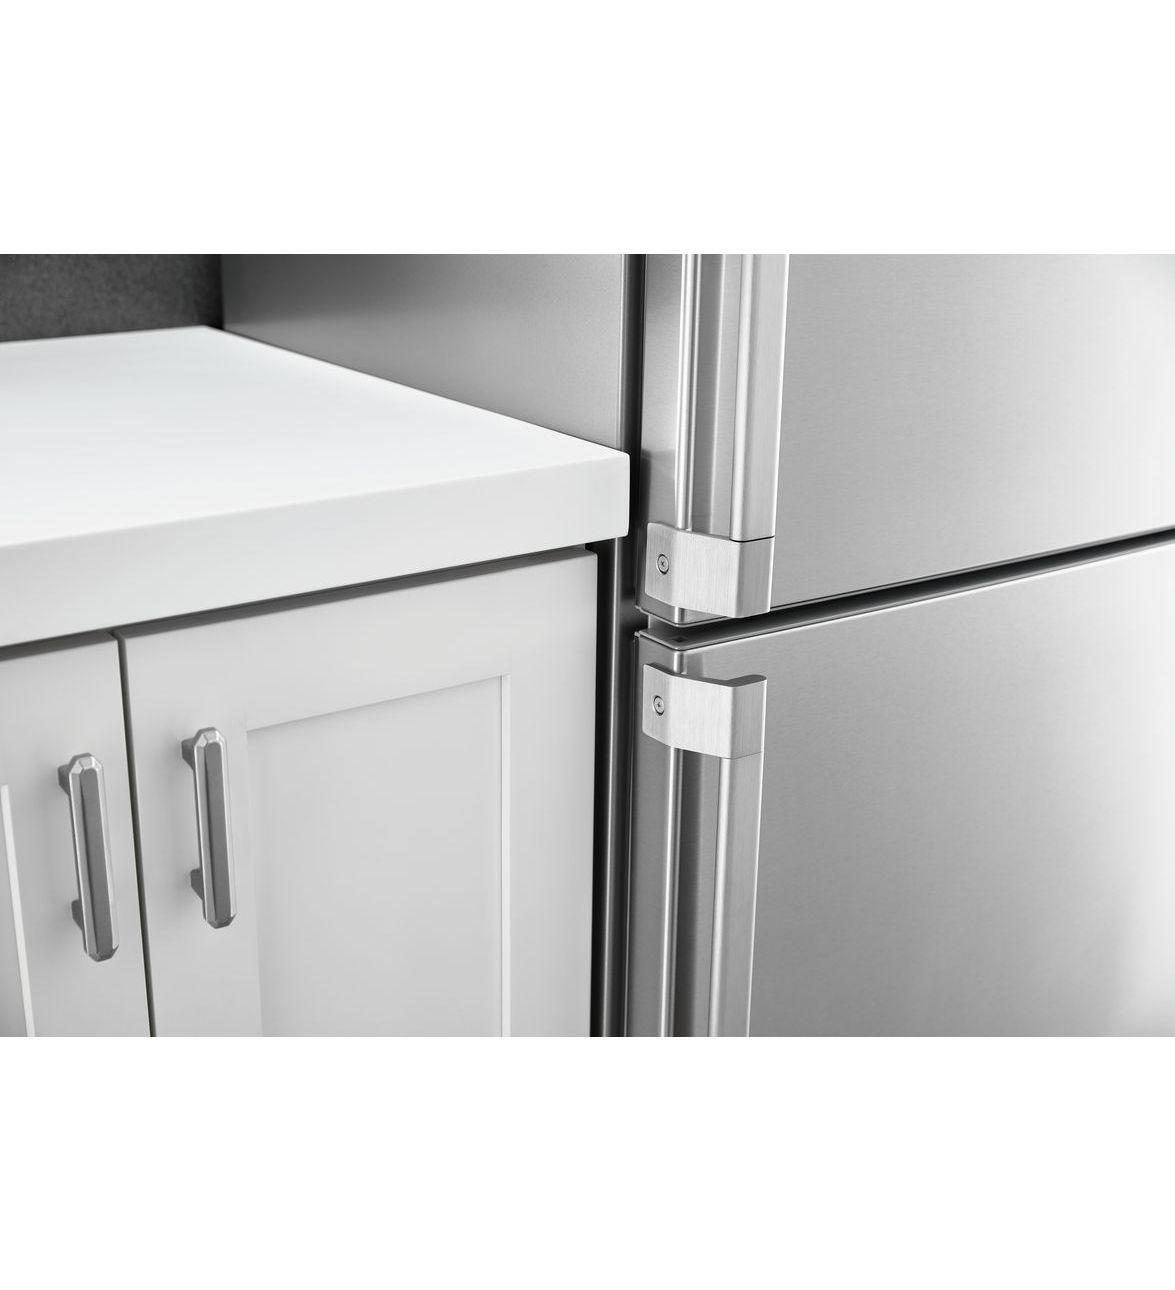 urb551wngz bottom mount refrigerator 24 inches wide. Black Bedroom Furniture Sets. Home Design Ideas